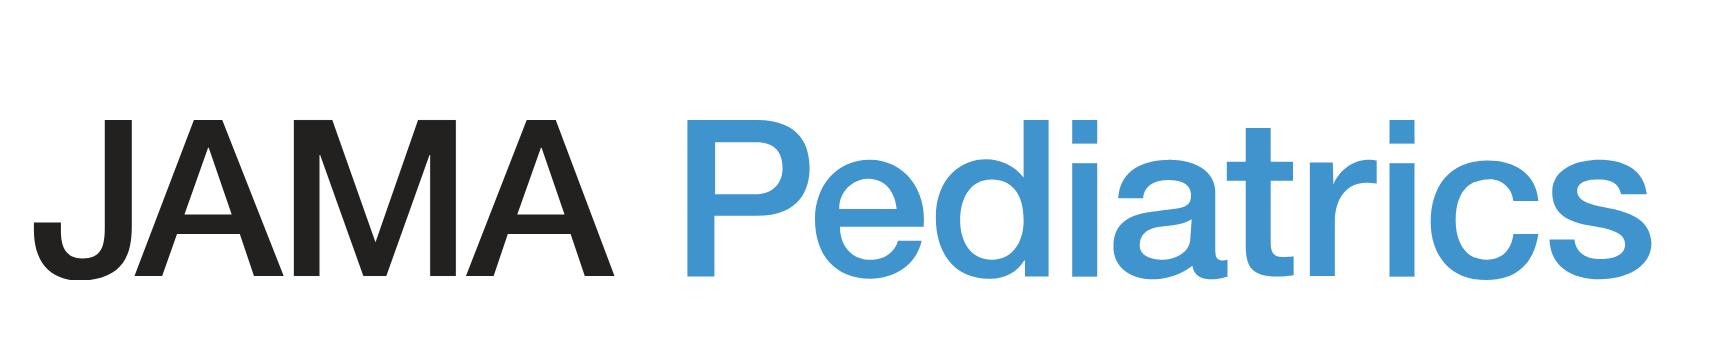 Jama Pediatrics logo